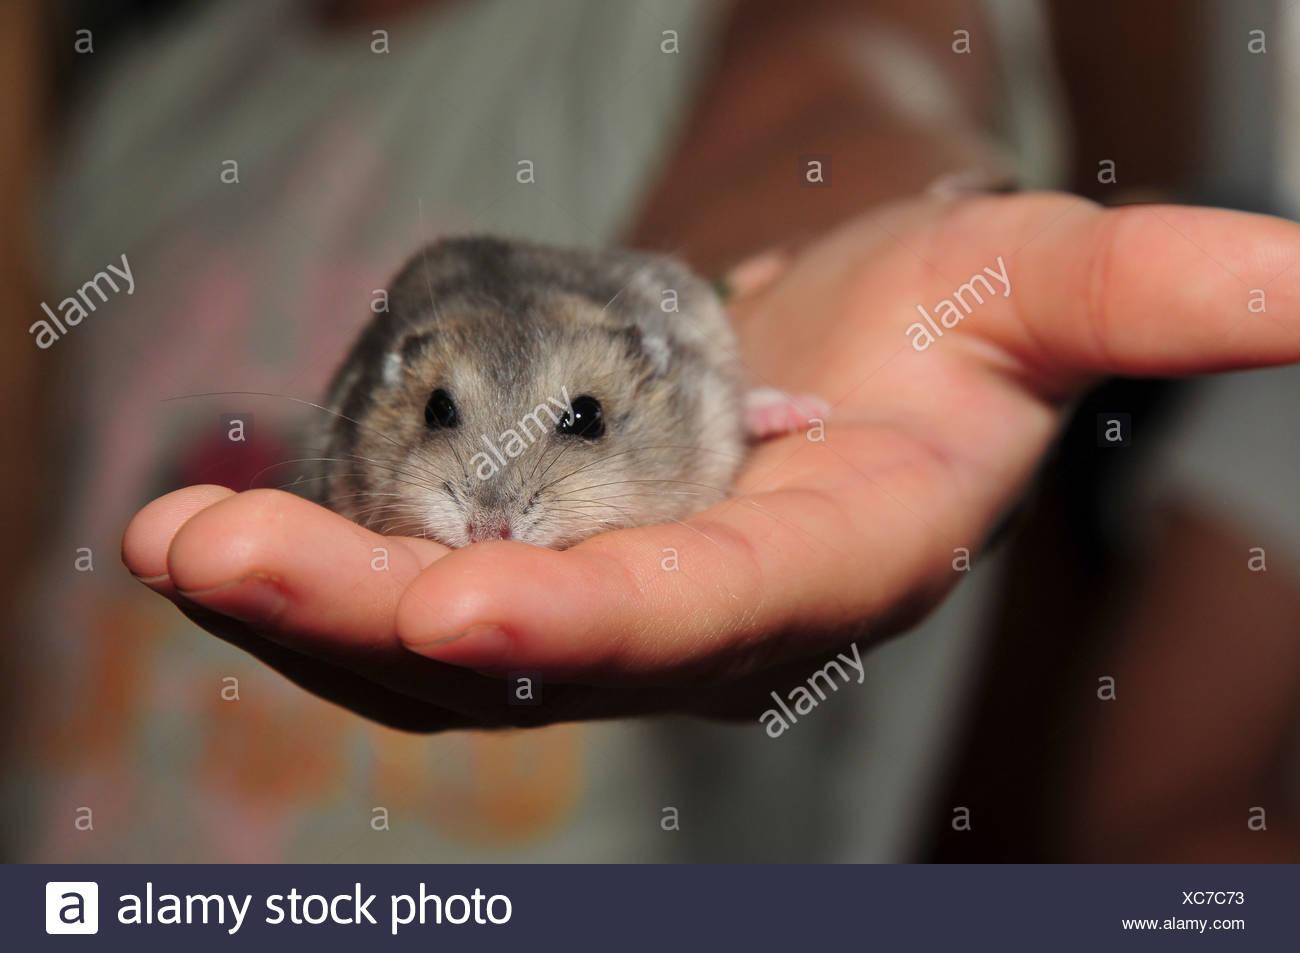 e5b7a5cf183 Pet Winter white Russian dwarf hamsters (Phodopus sungorus) - Stock Image